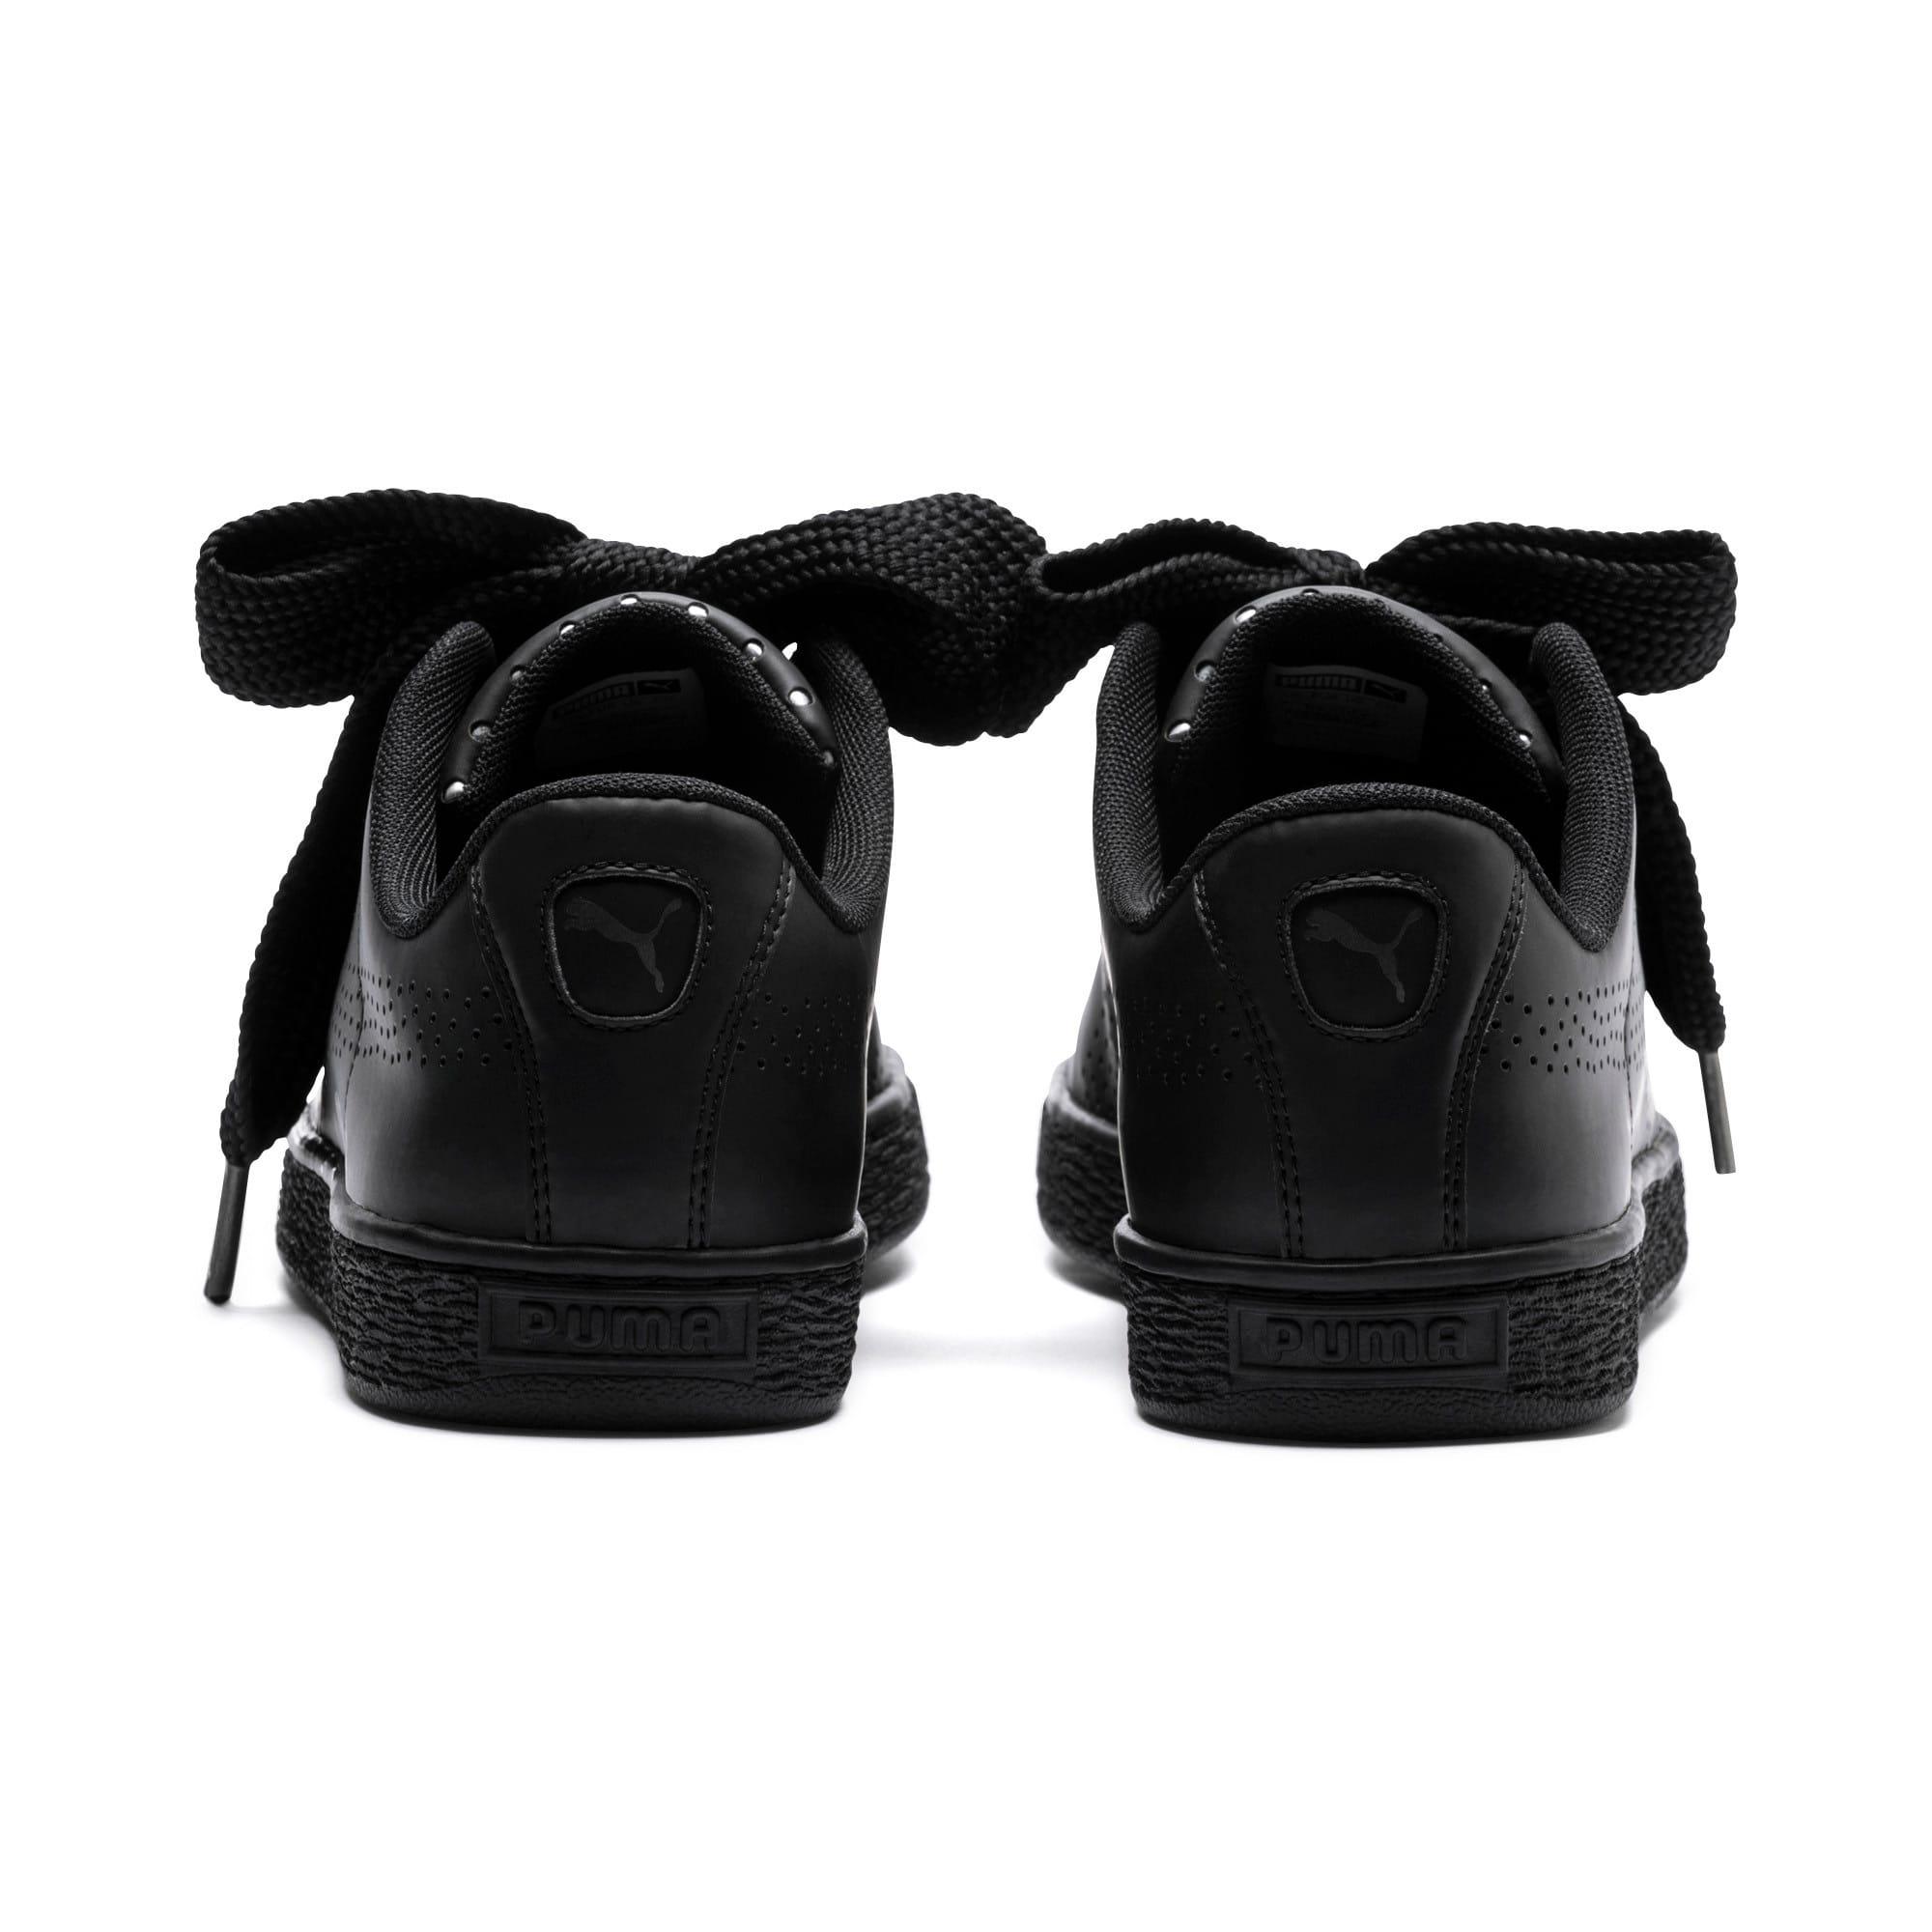 Thumbnail 4 of Basket Heart Lux Women's Sneakers, Puma Black-Puma Black, medium